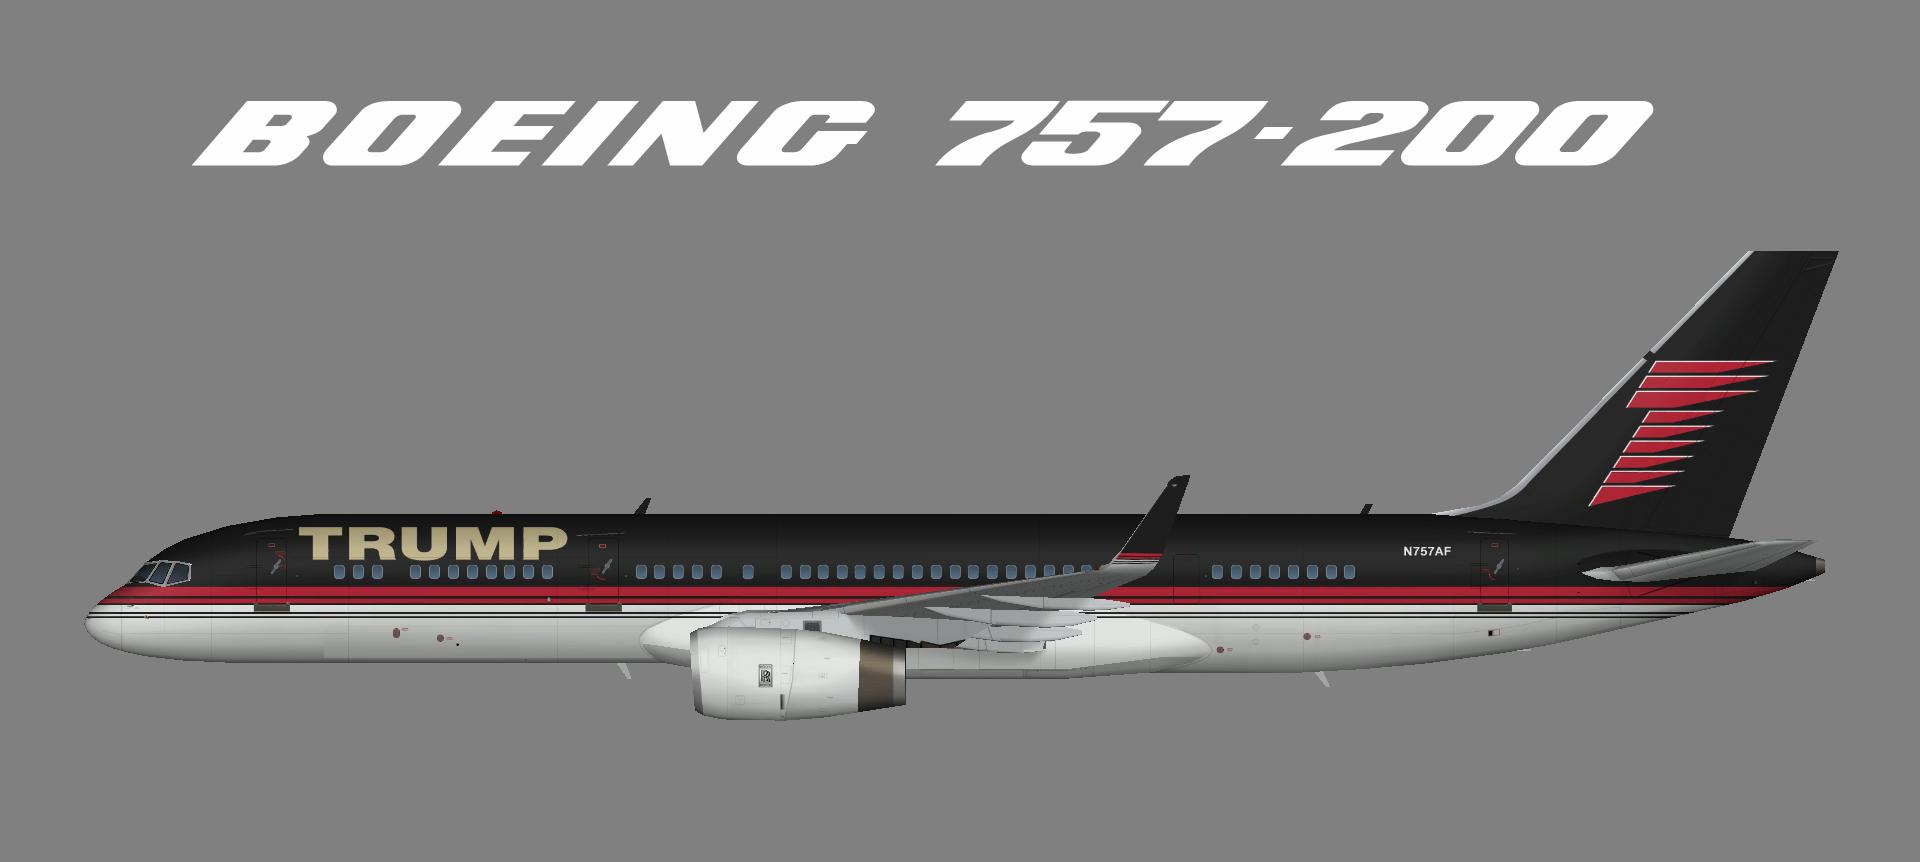 DJT Operations 757-200